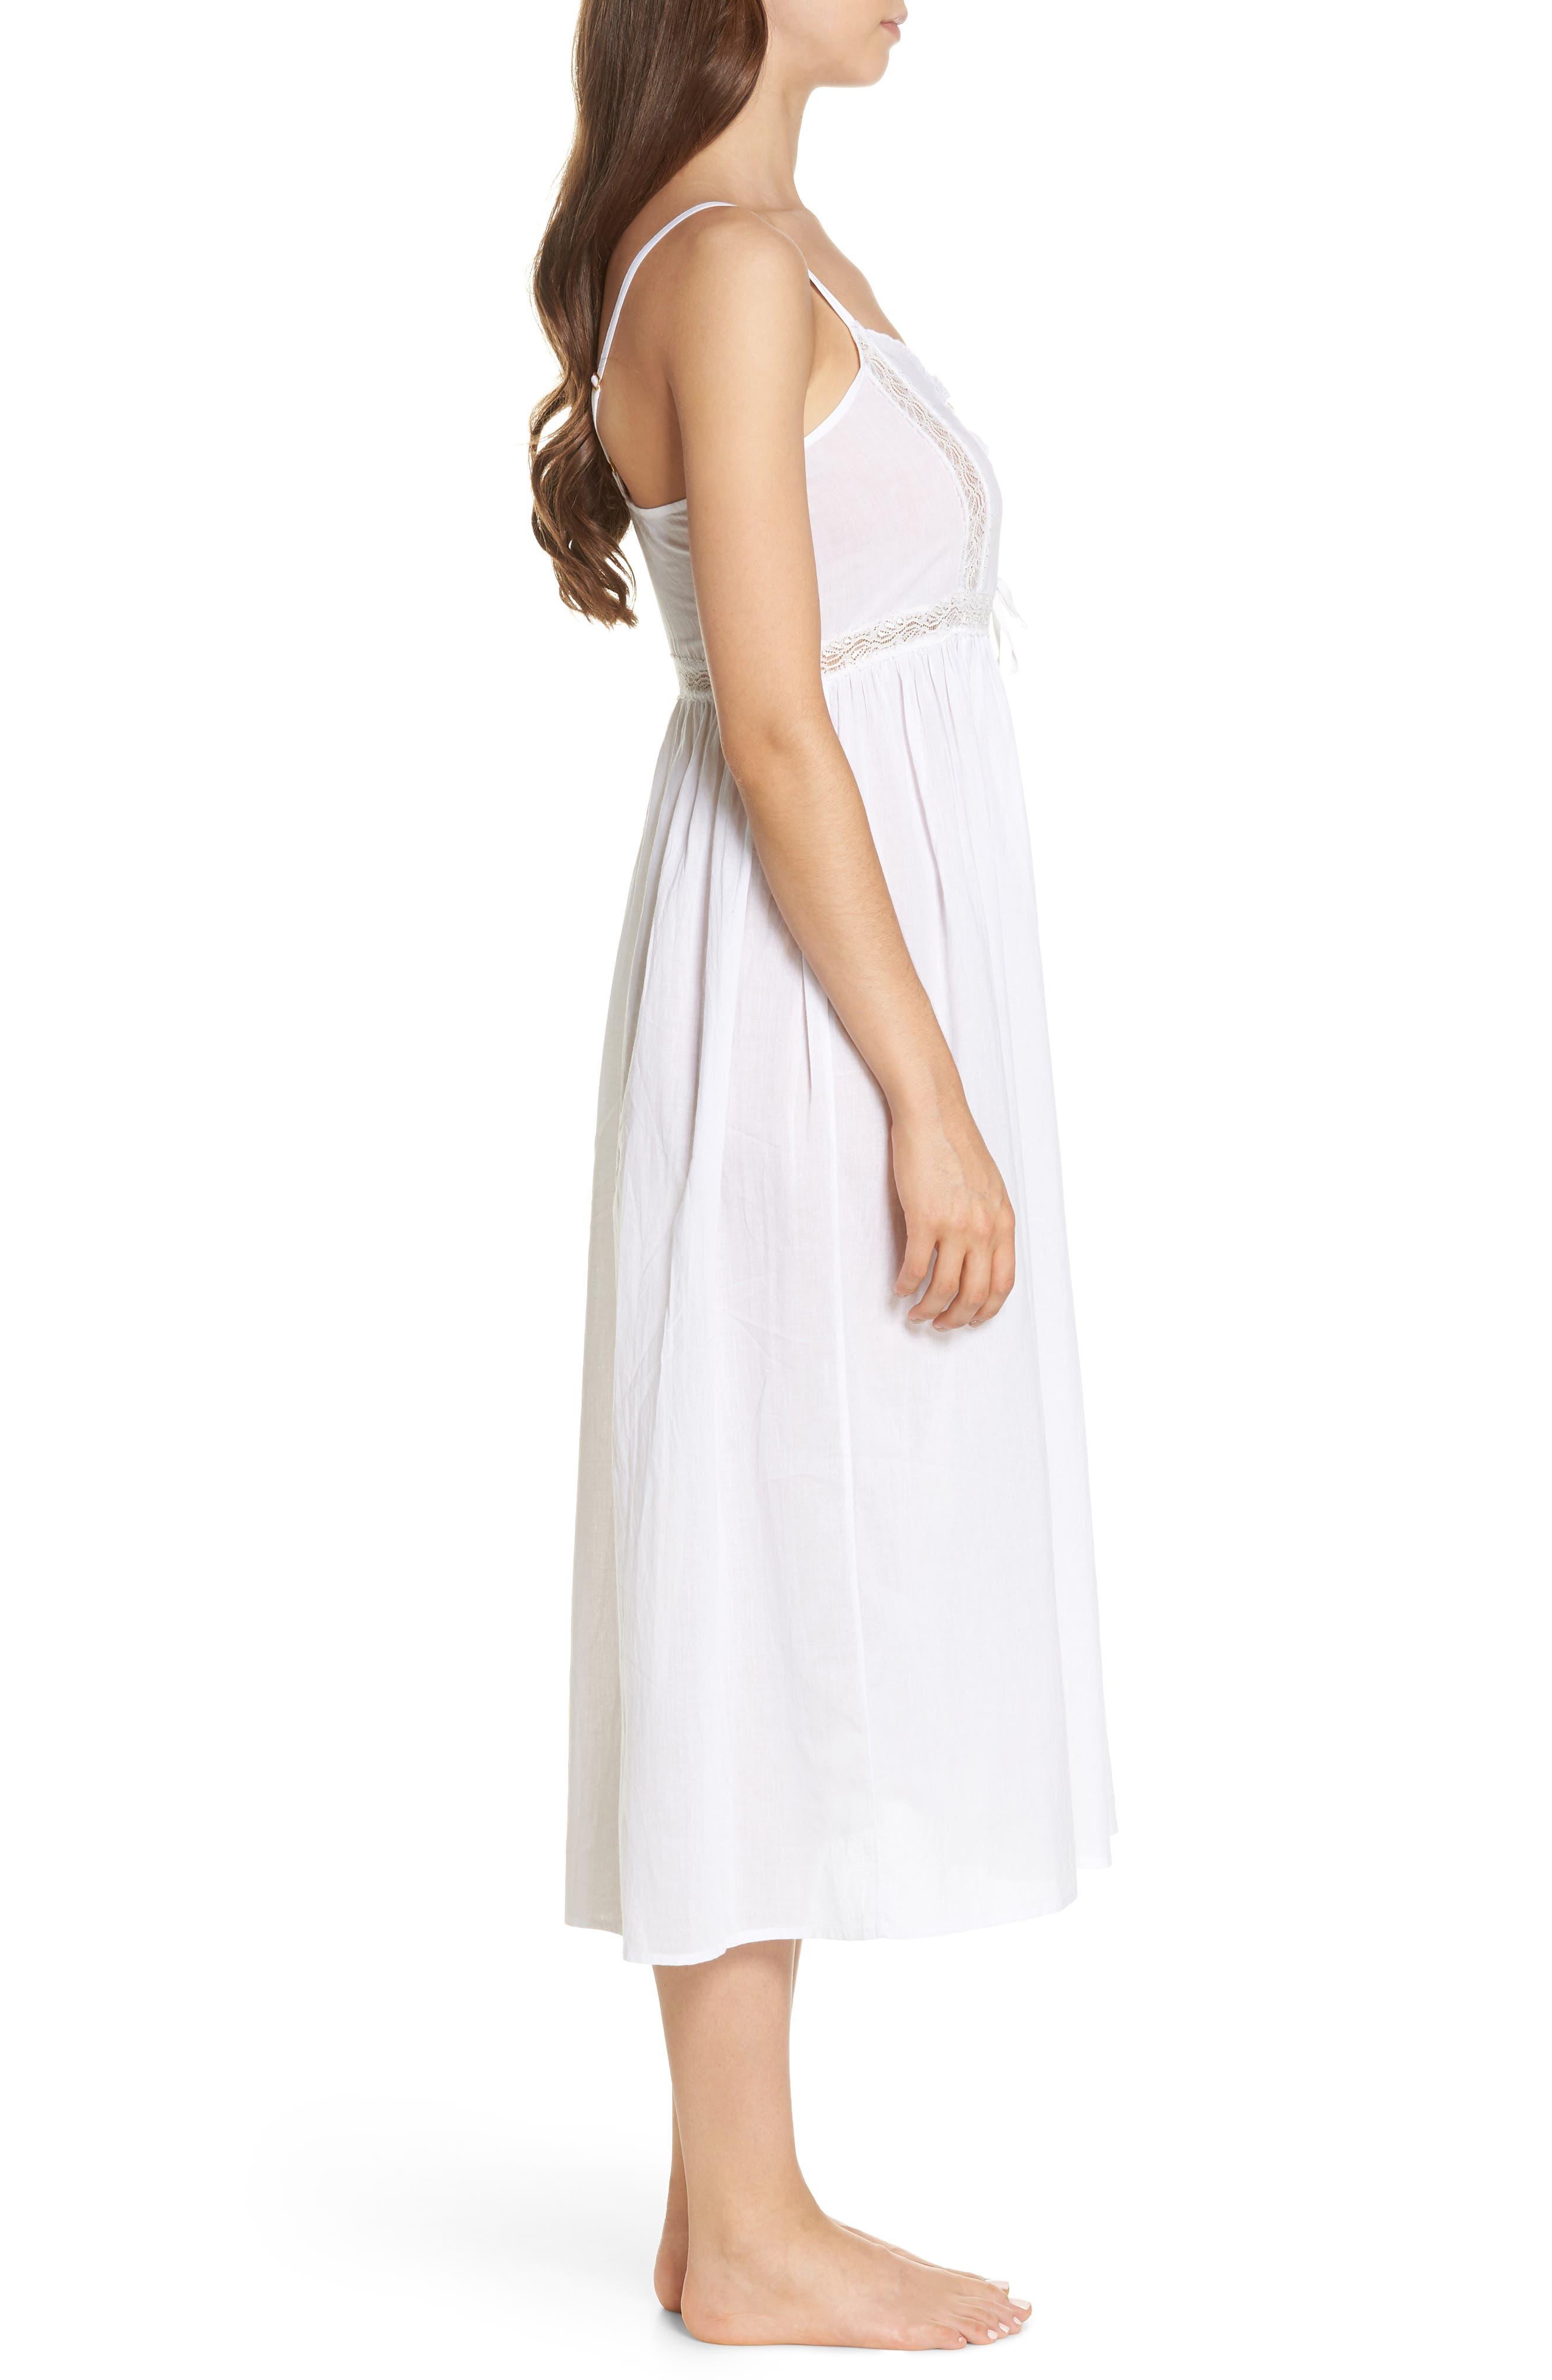 Lace Trim Nightgown,                             Alternate thumbnail 3, color,                             White